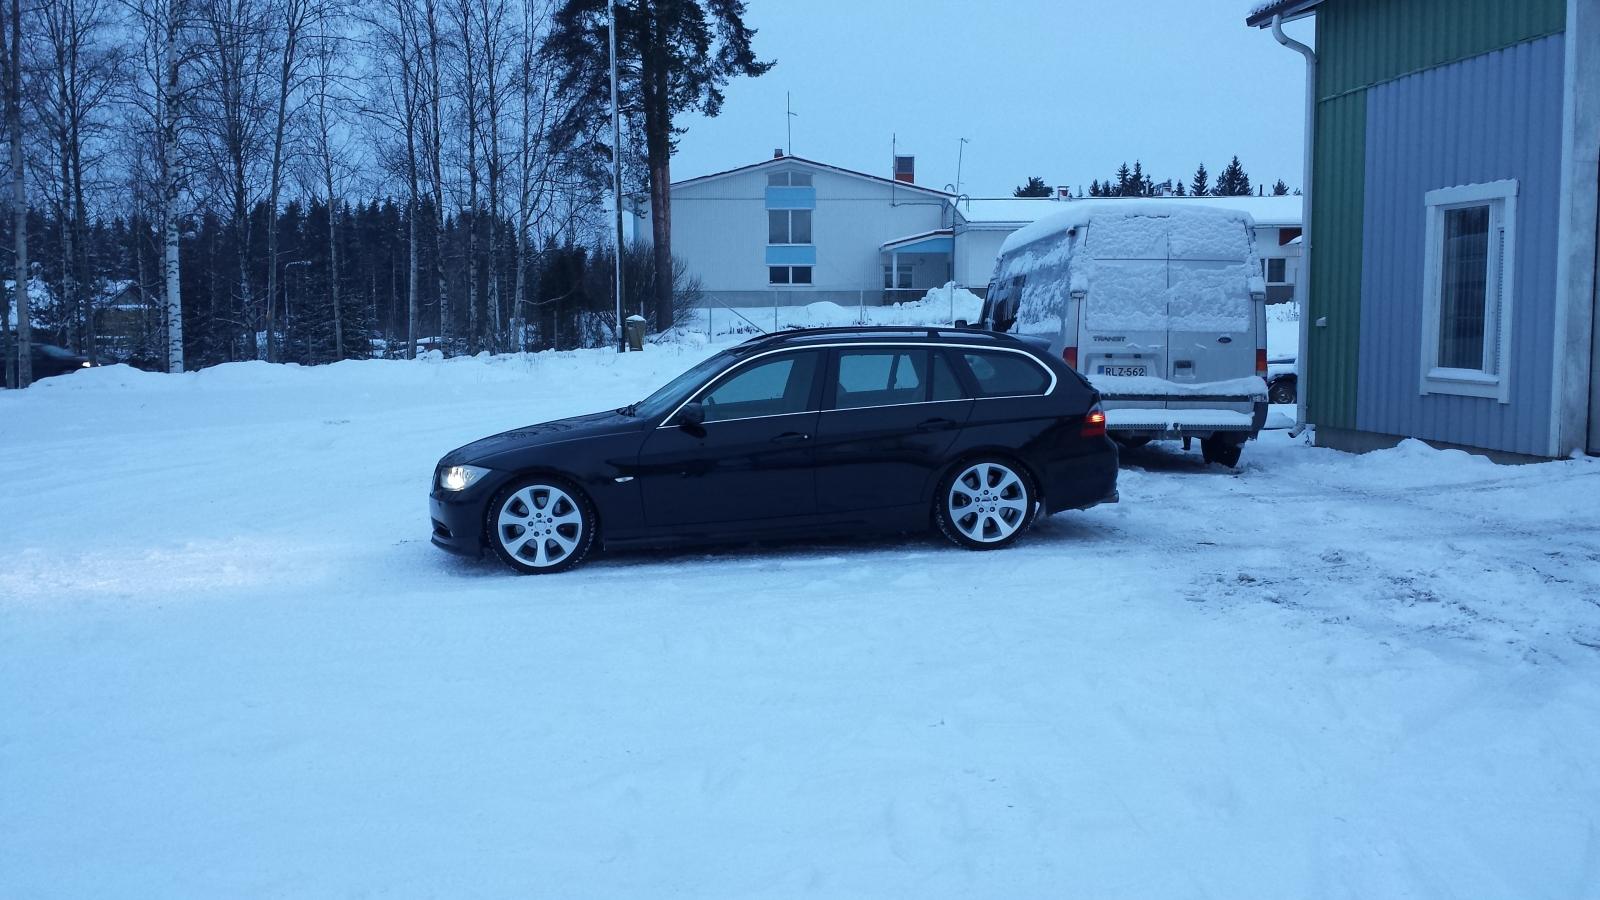 Talvilook/Winter beater - Sivu 16 30v2gp4